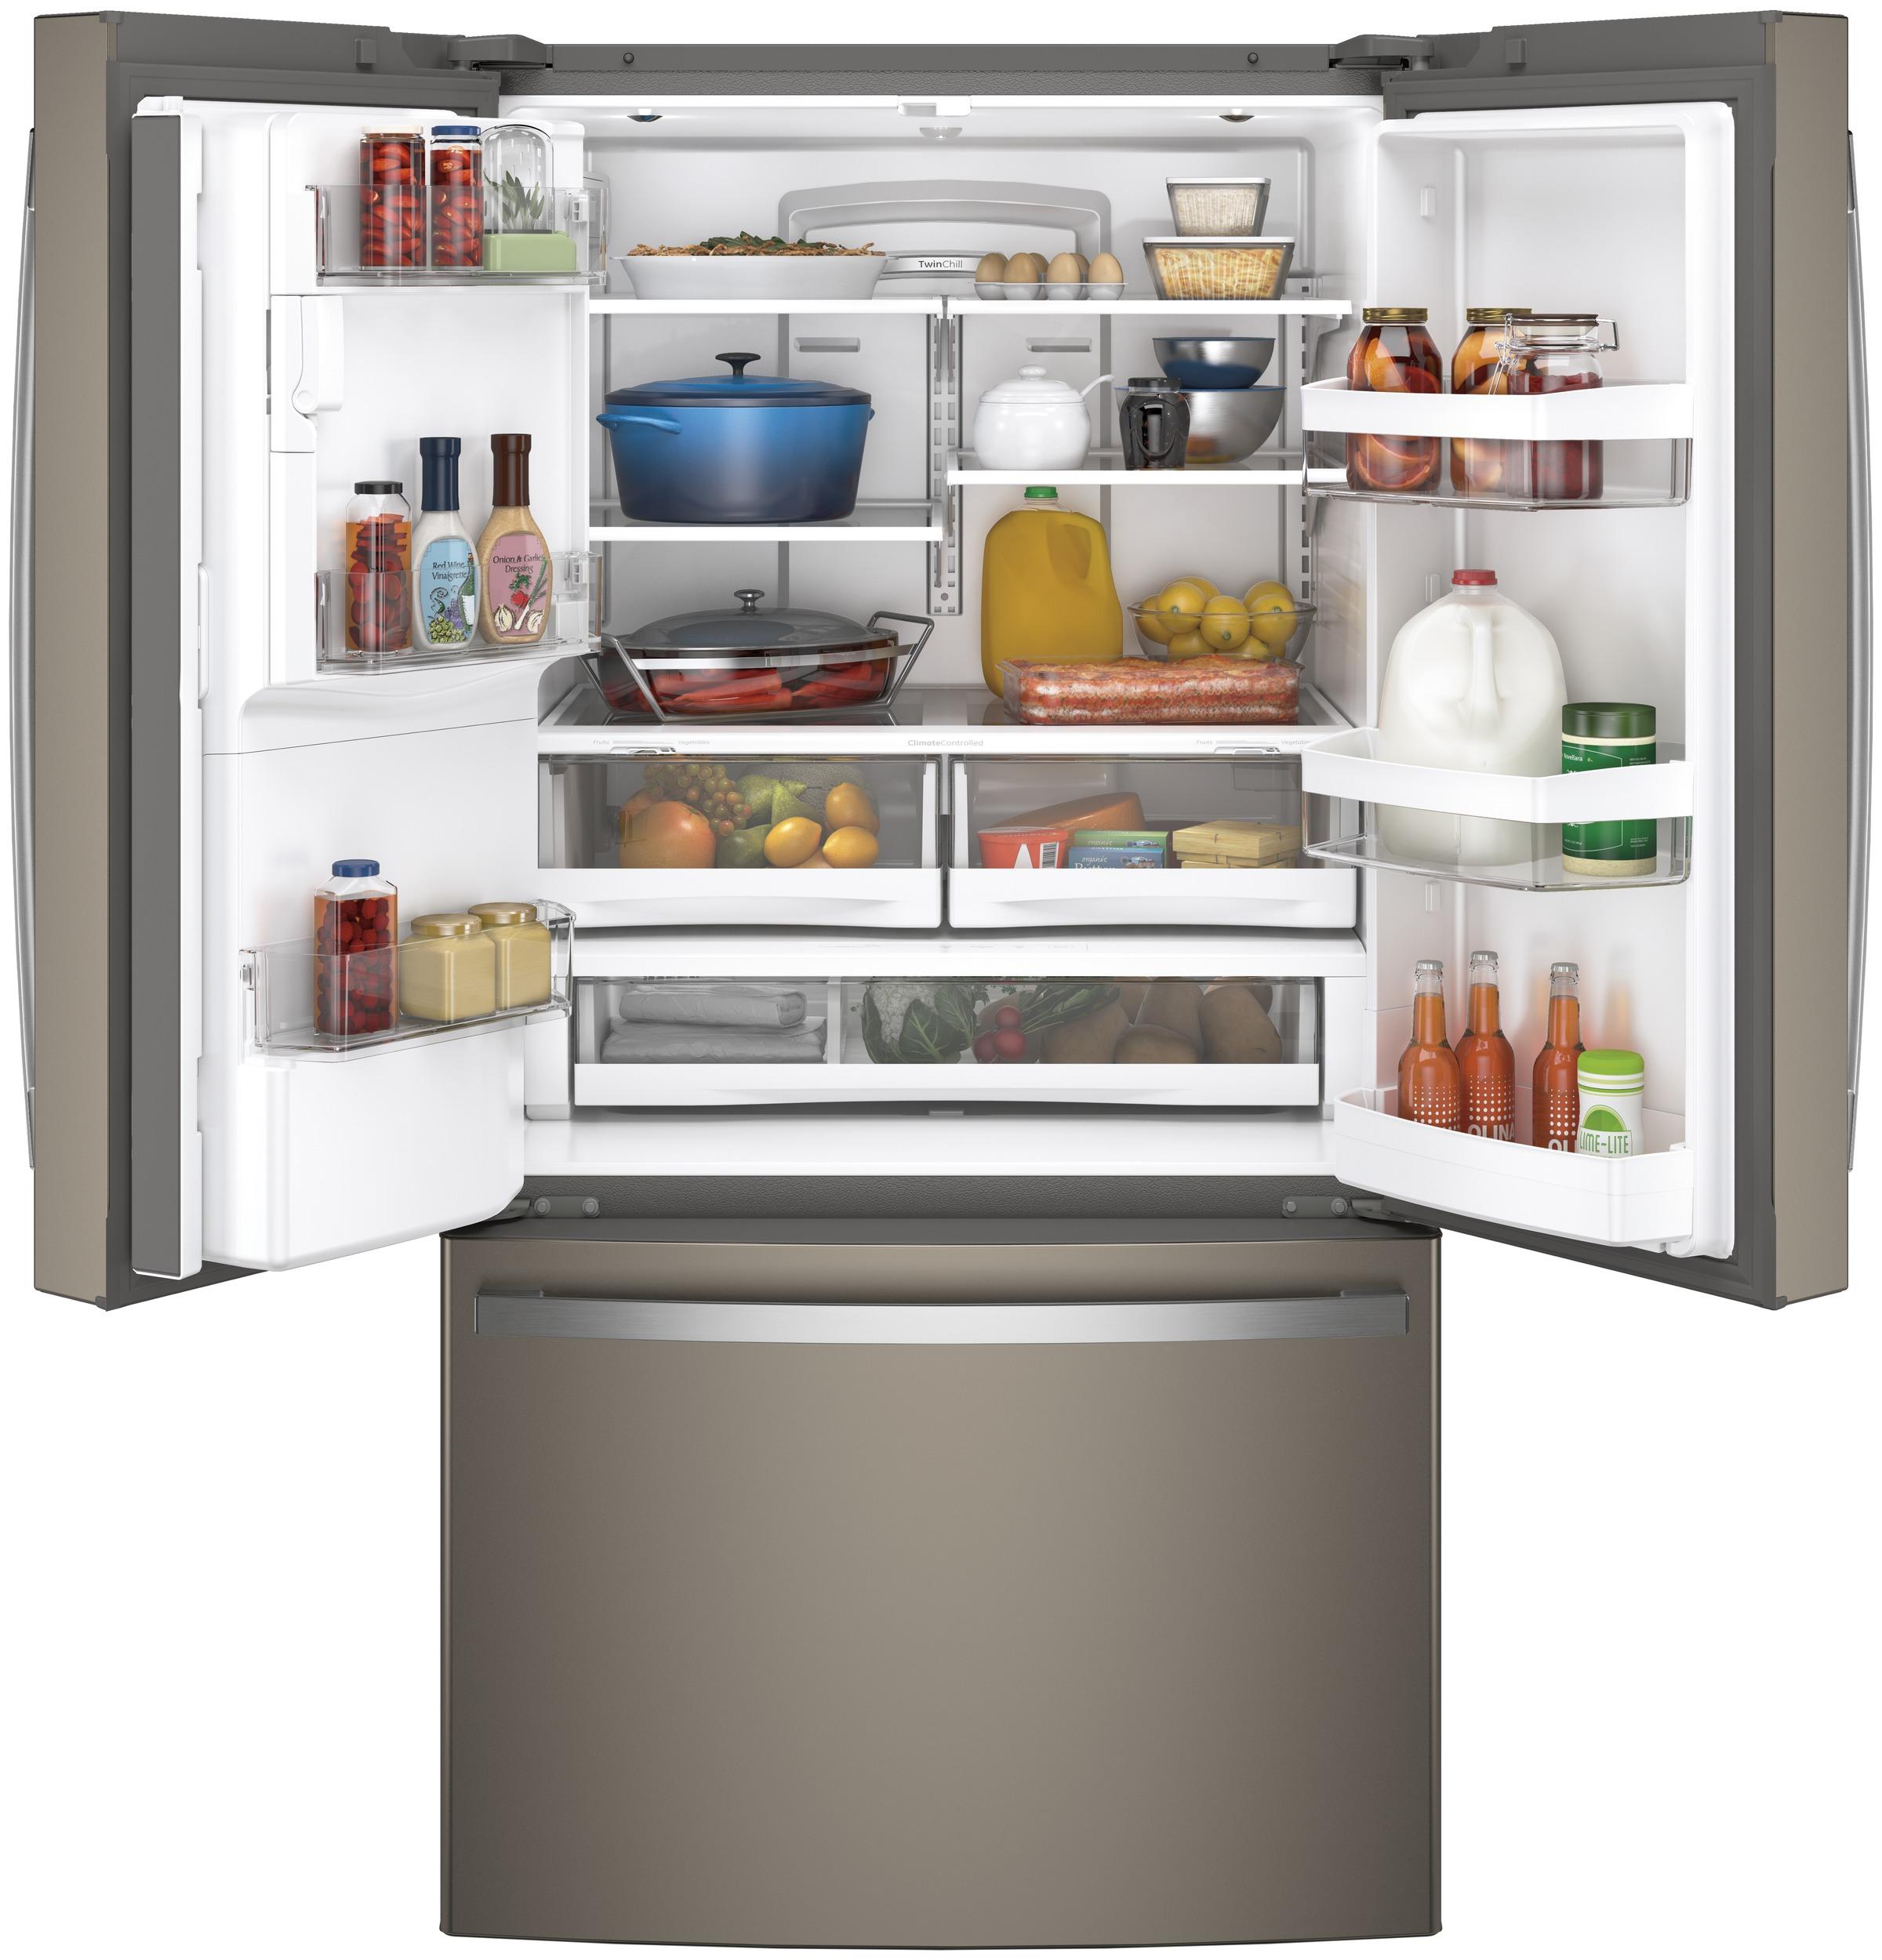 Model: GFE28GMKES | GE GE® ENERGY STAR® 27.7 Cu. Ft. French-Door Refrigerator